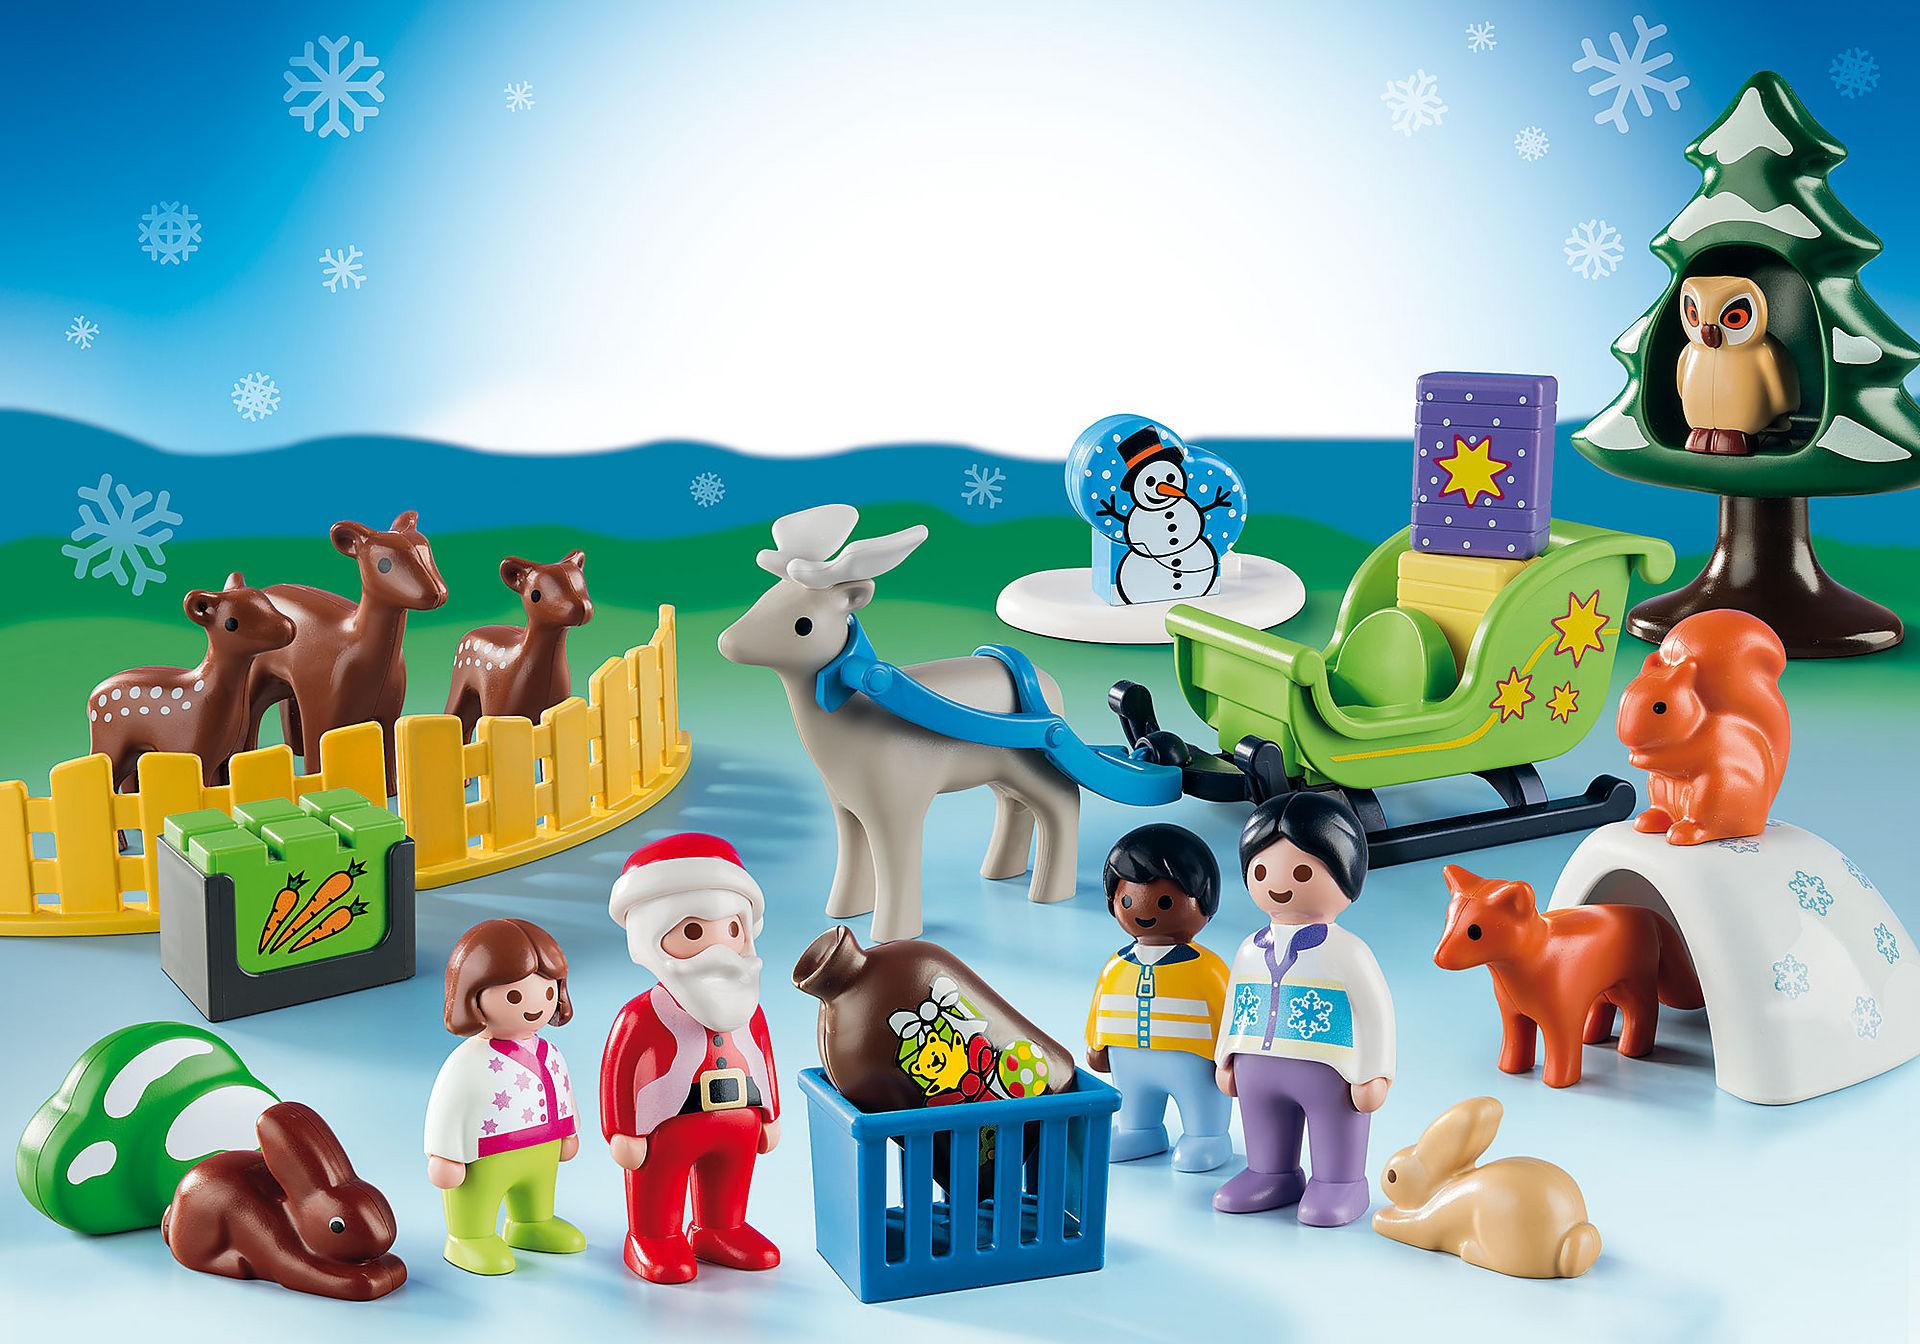 http://media.playmobil.com/i/playmobil/9391_product_extra1/Χριστουγεννιάτικο Ημερολόγιο - Χριστούγεννα στο δάσος